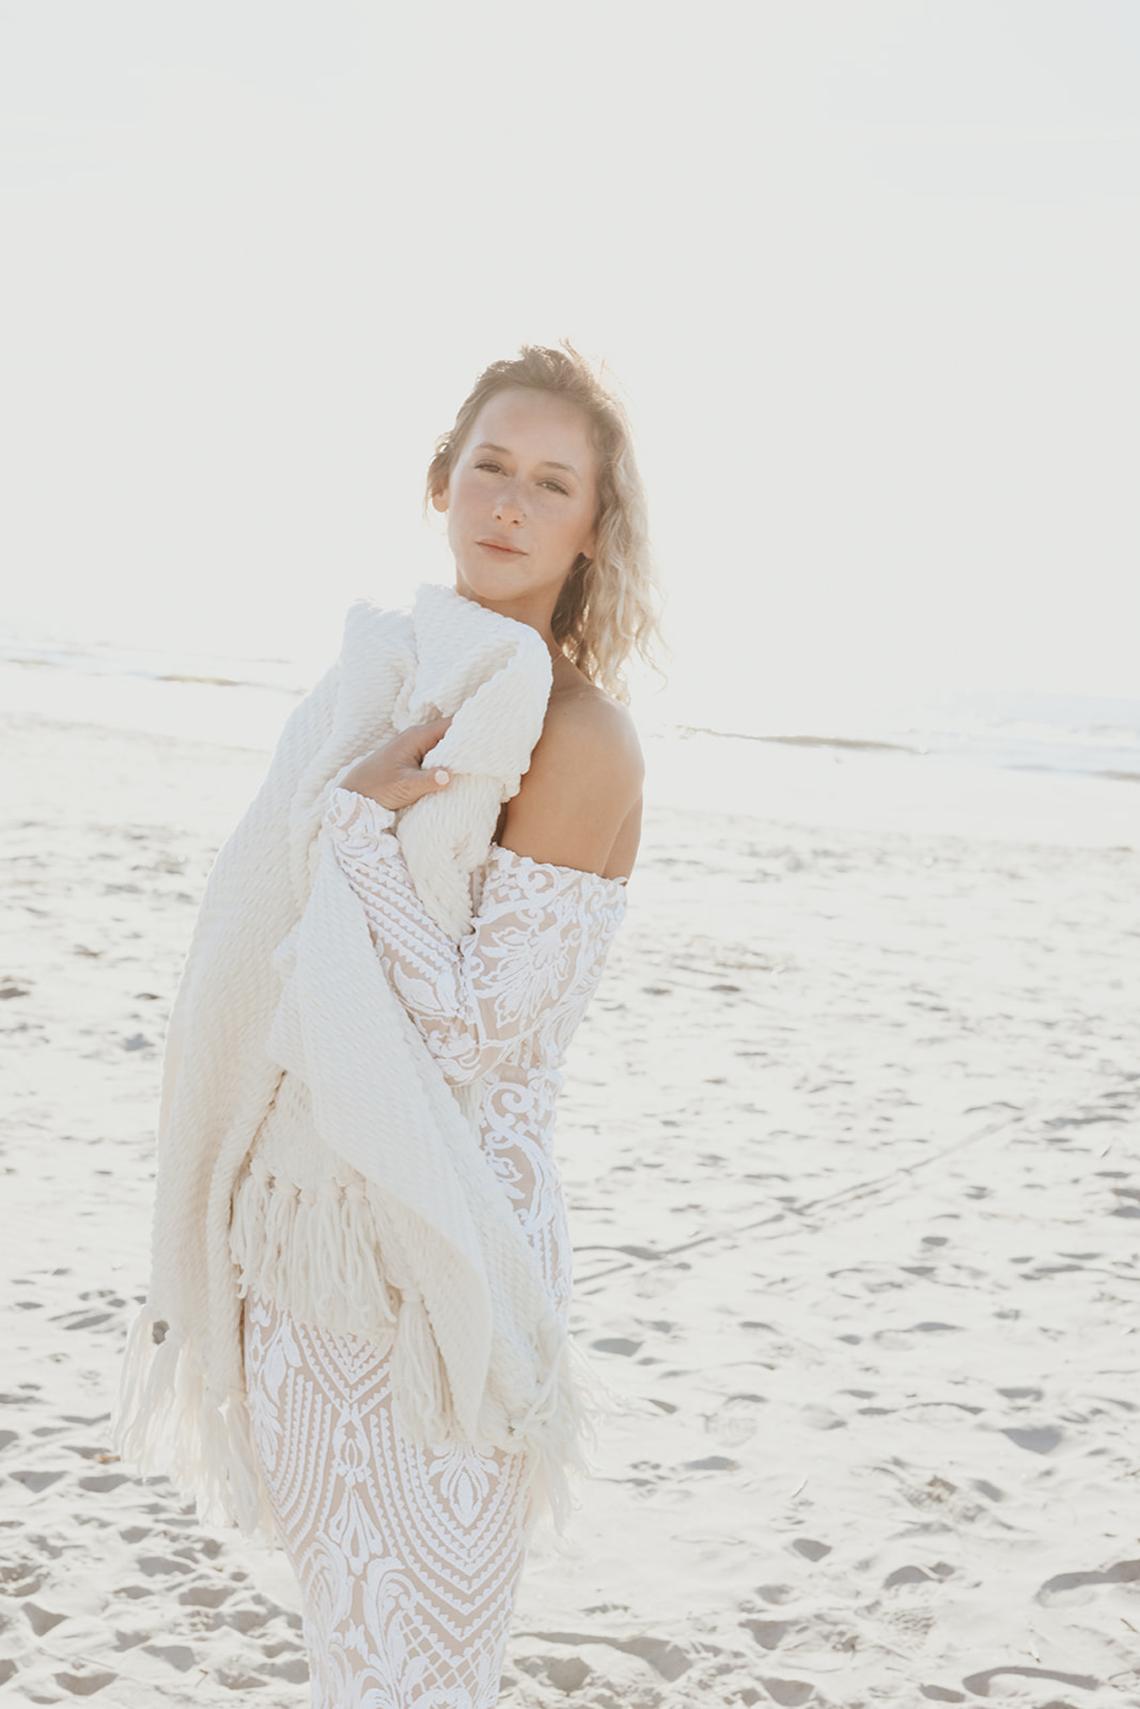 Bohemian Beach Wedding Inspiration With Agave Decor – Georgia Grace – Salt and Stem 9